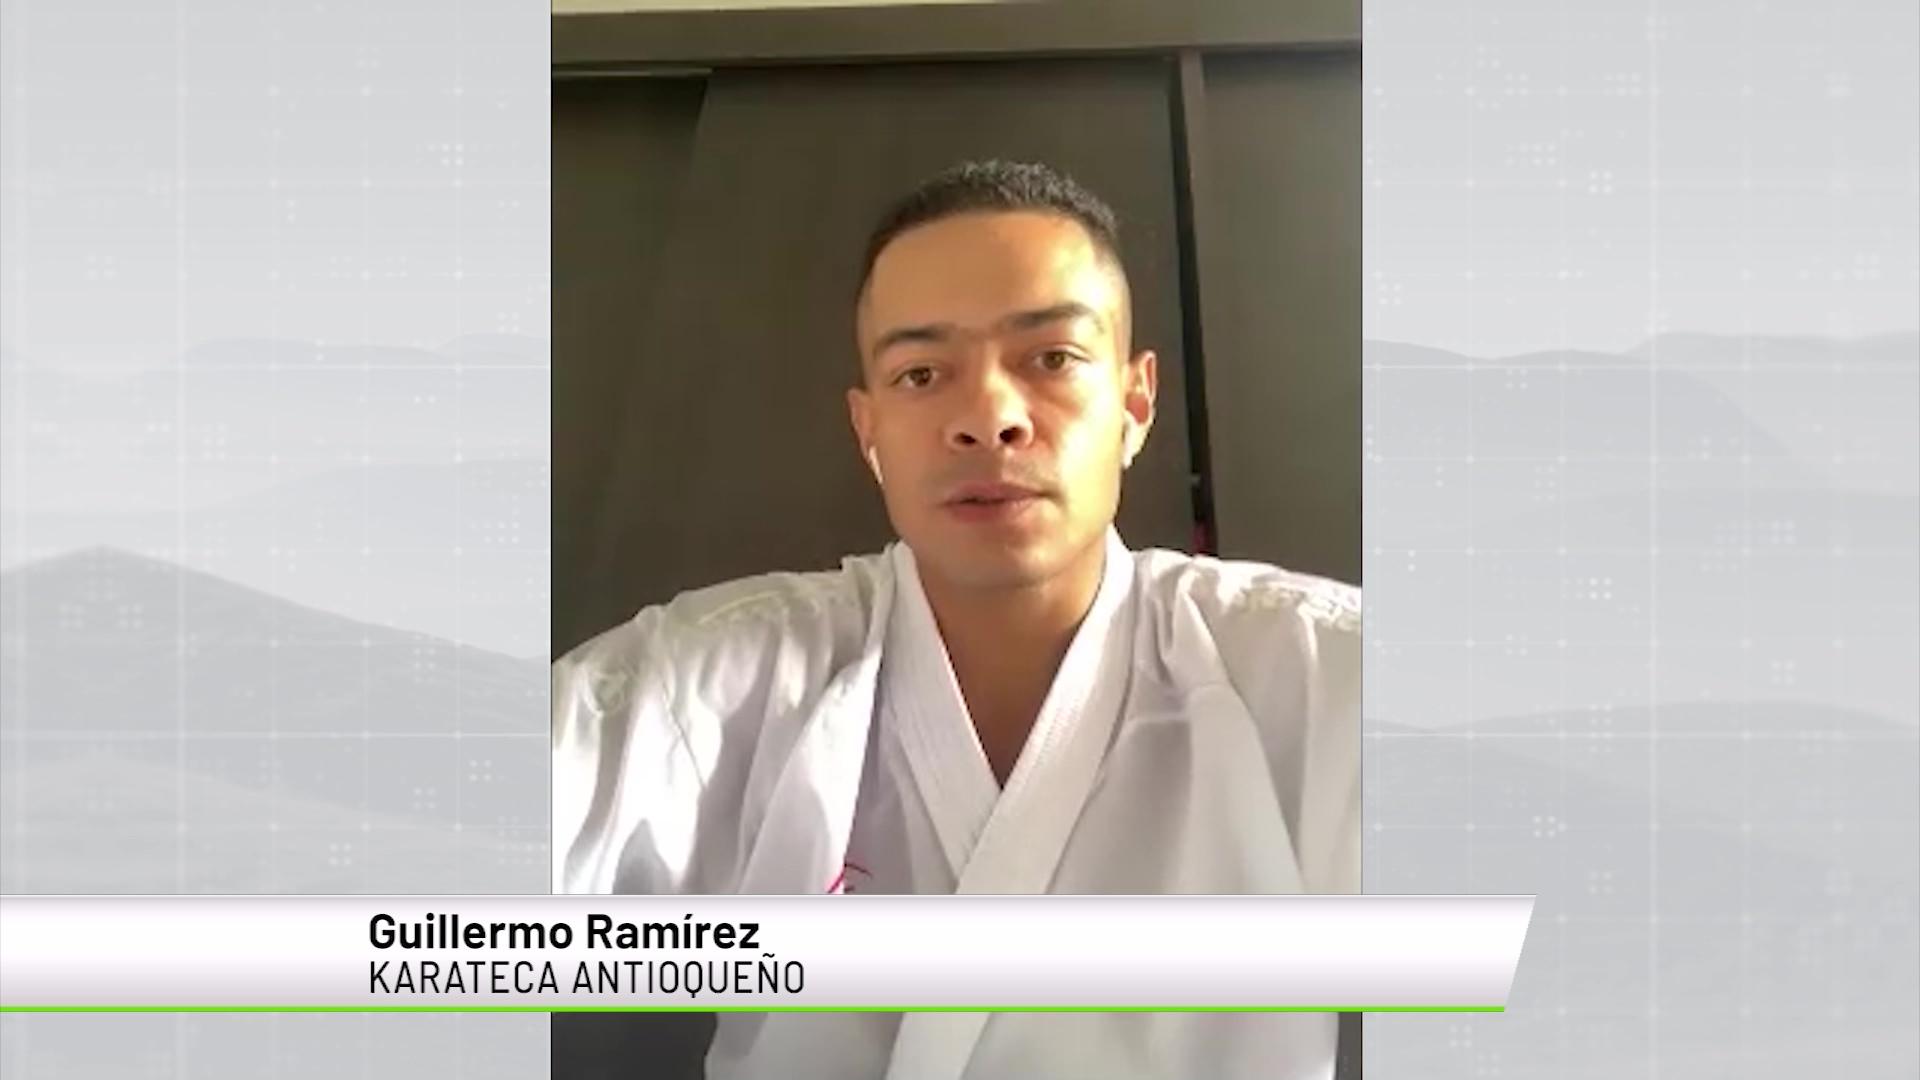 Guillermo Ramírez regresa a competencia